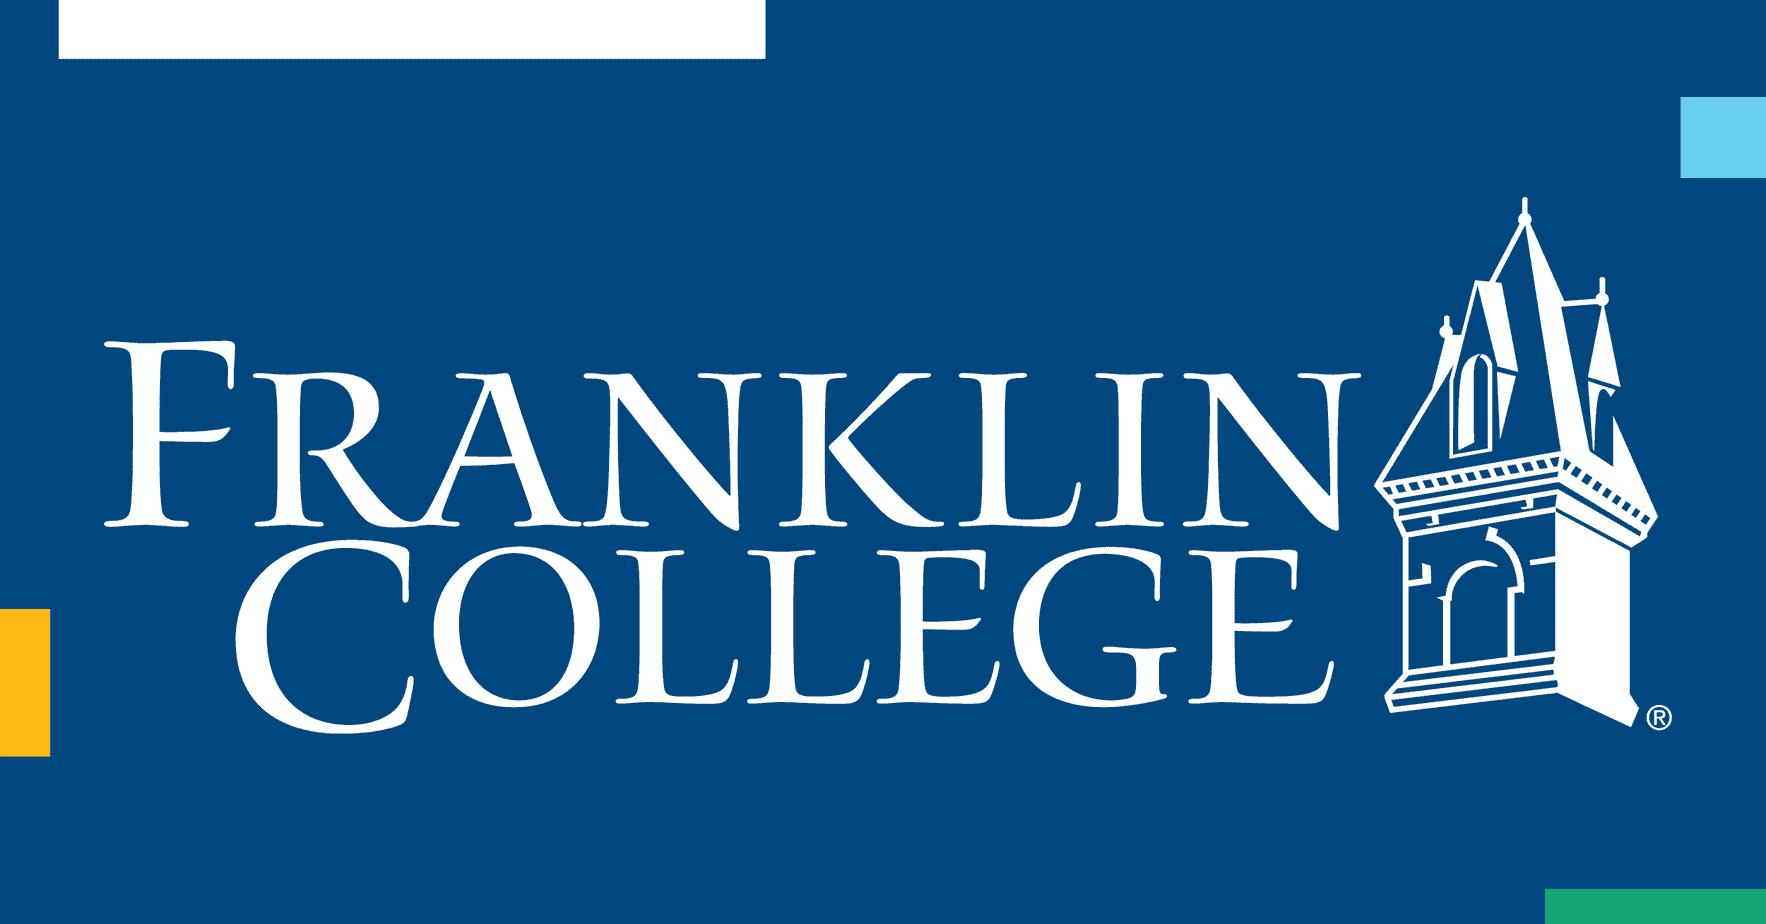 Franklin College | Liberal Arts School in Franklin, Indiana